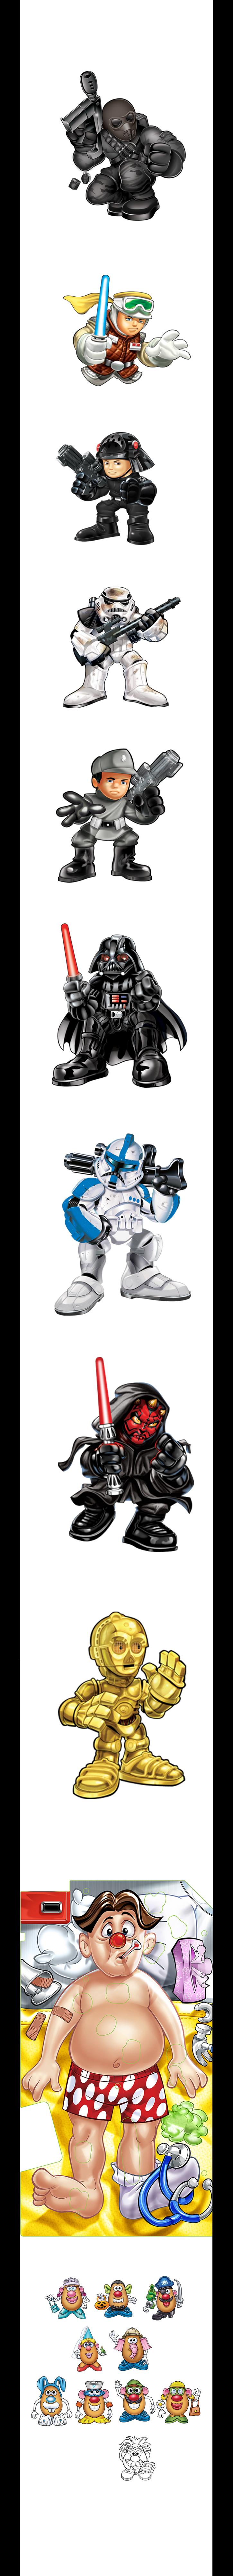 star wars Character darth vadar light saber game